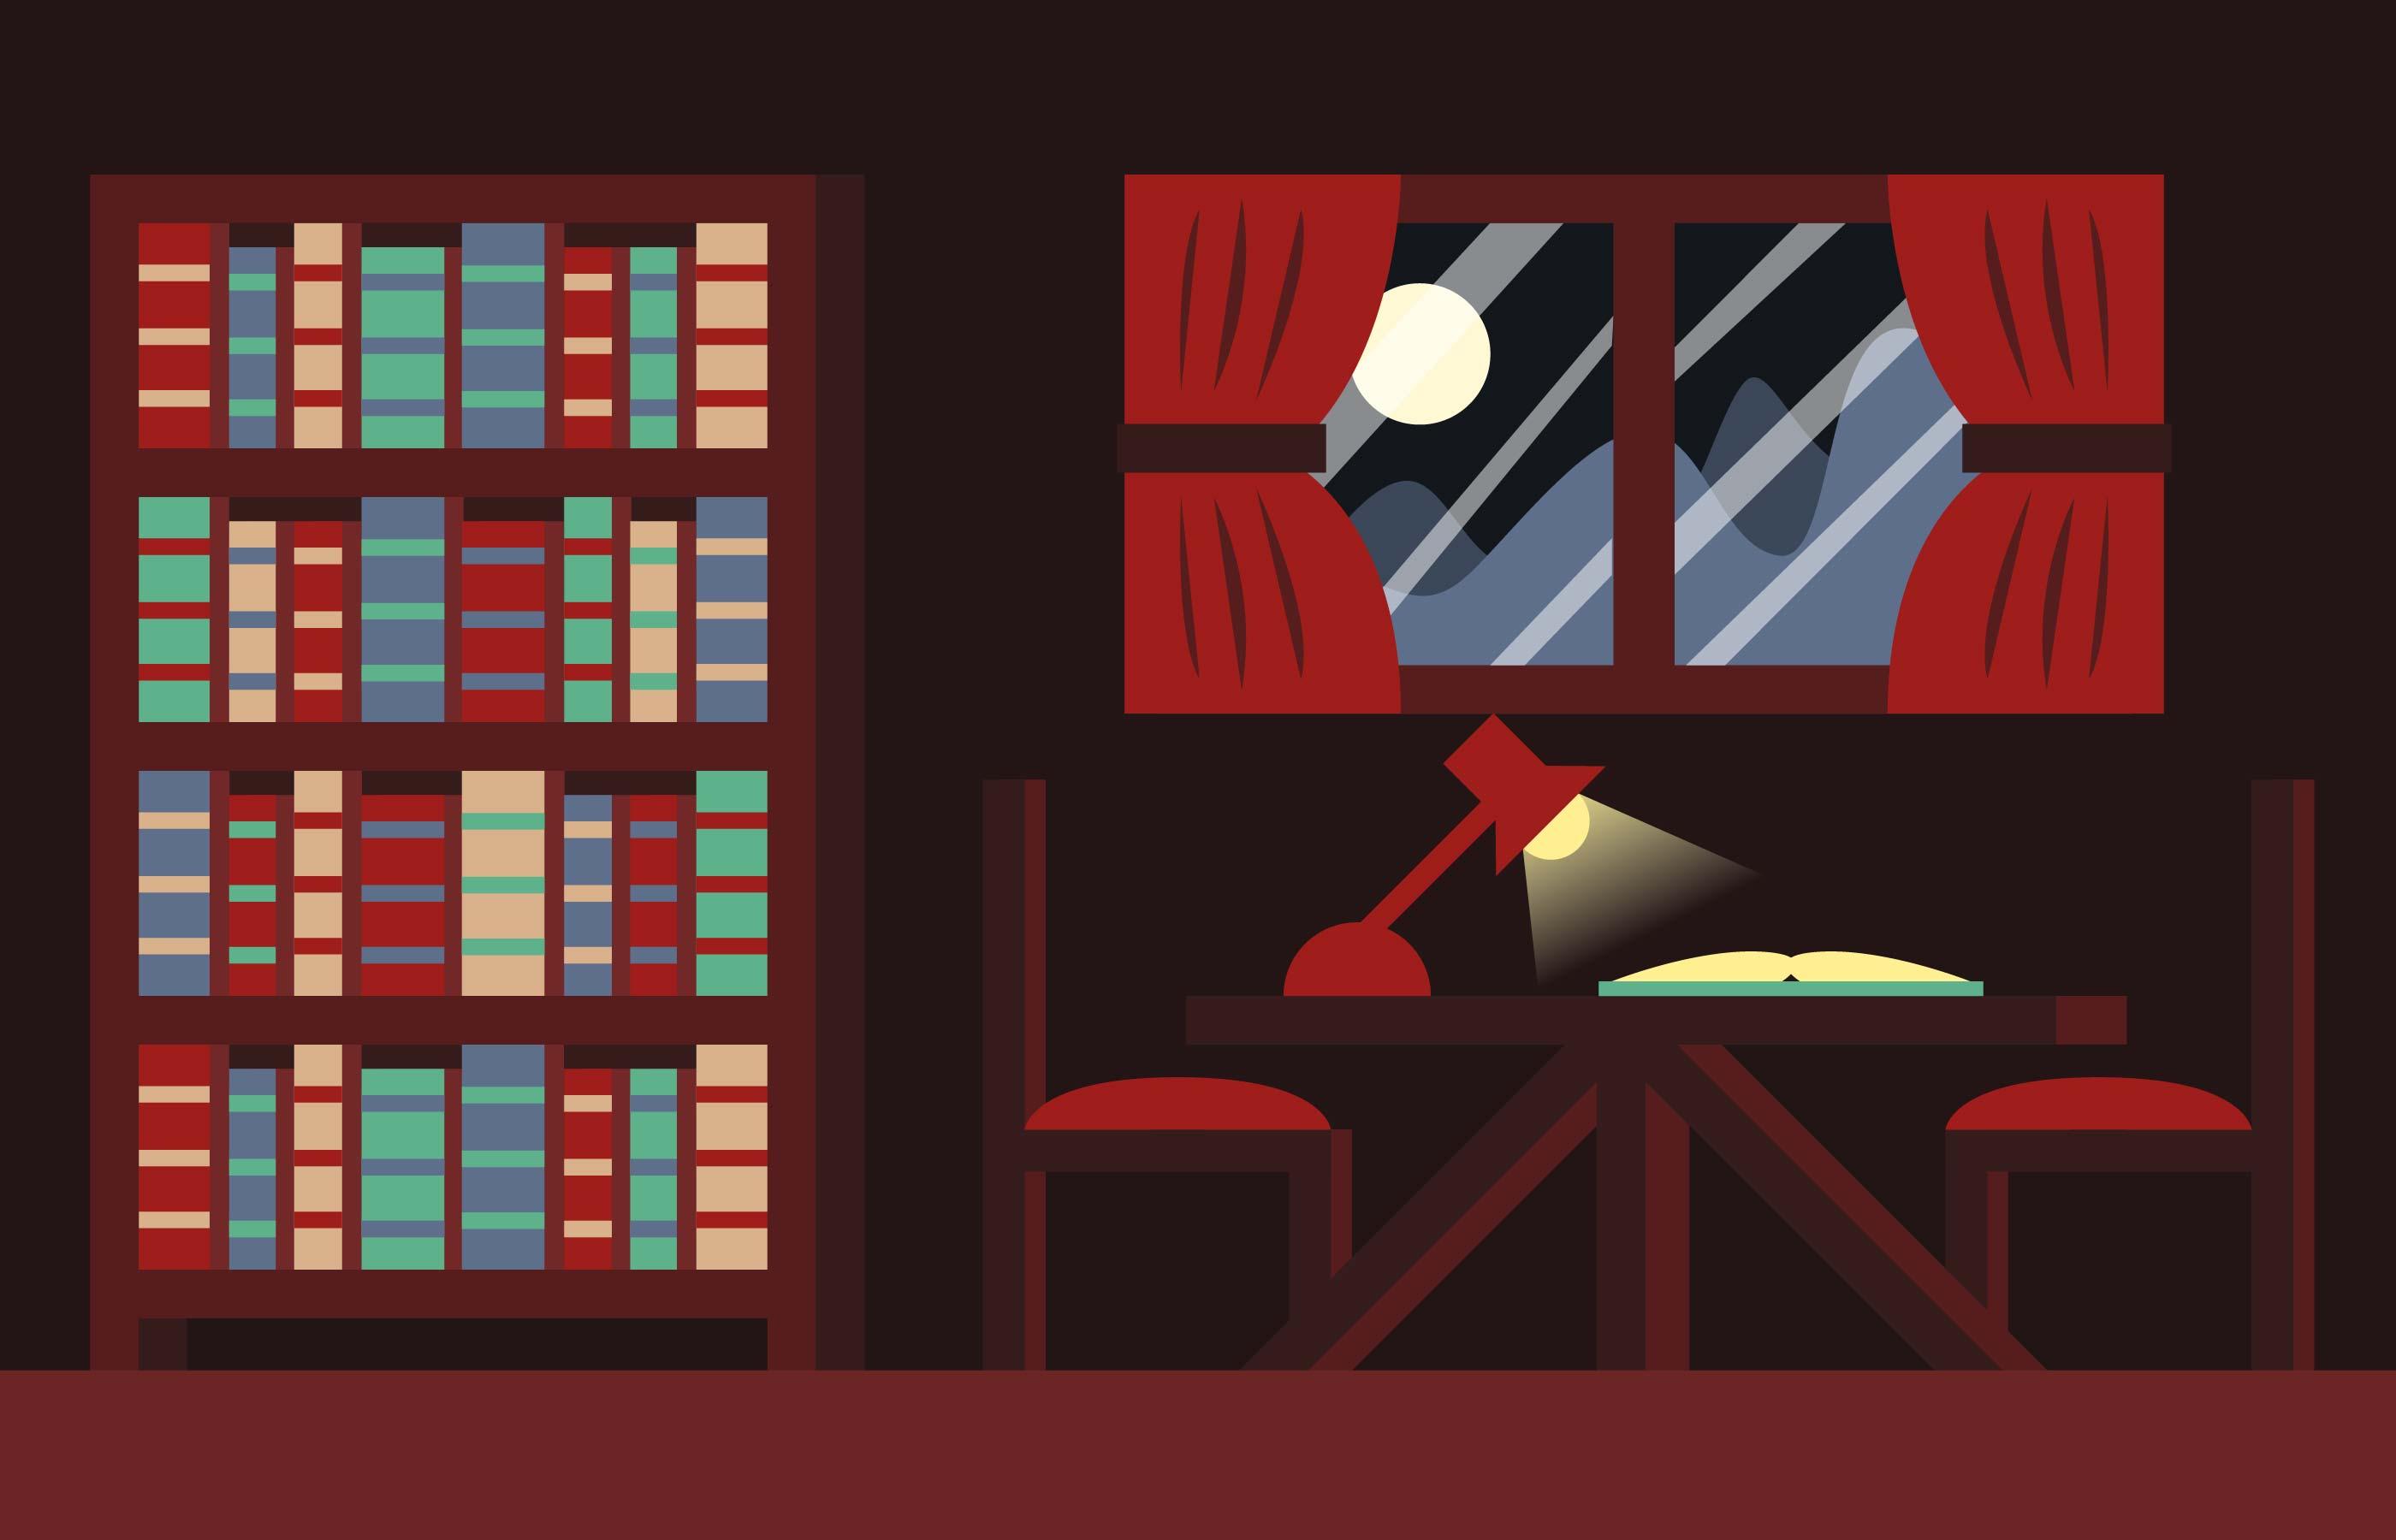 Libro Books Room Background Illustration Vector Download Free Vectors Clipart Graphics